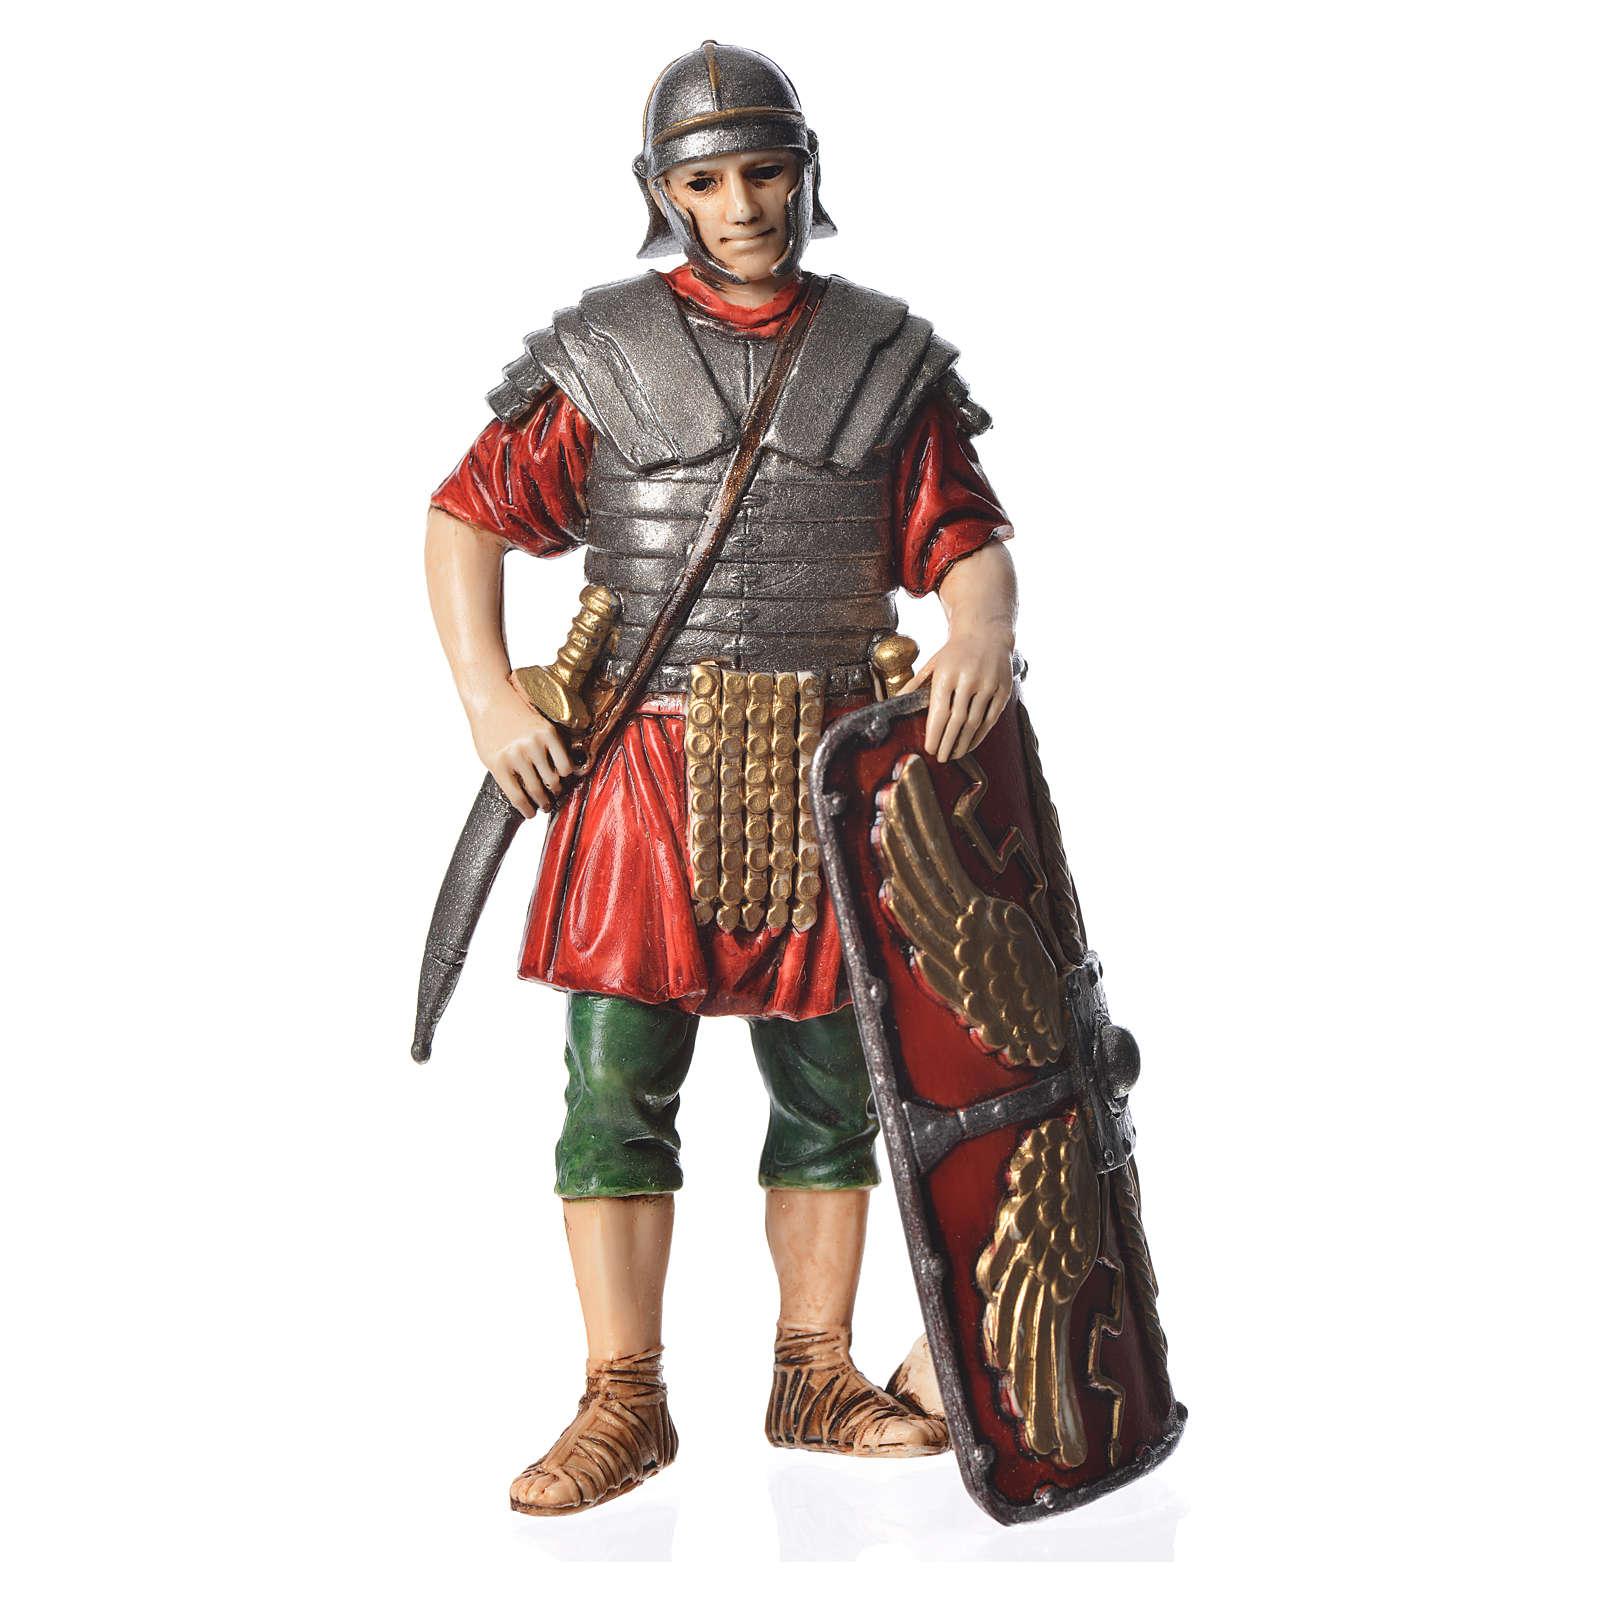 Soldat romain avec bouclier 13 cm Moranduzzo 4